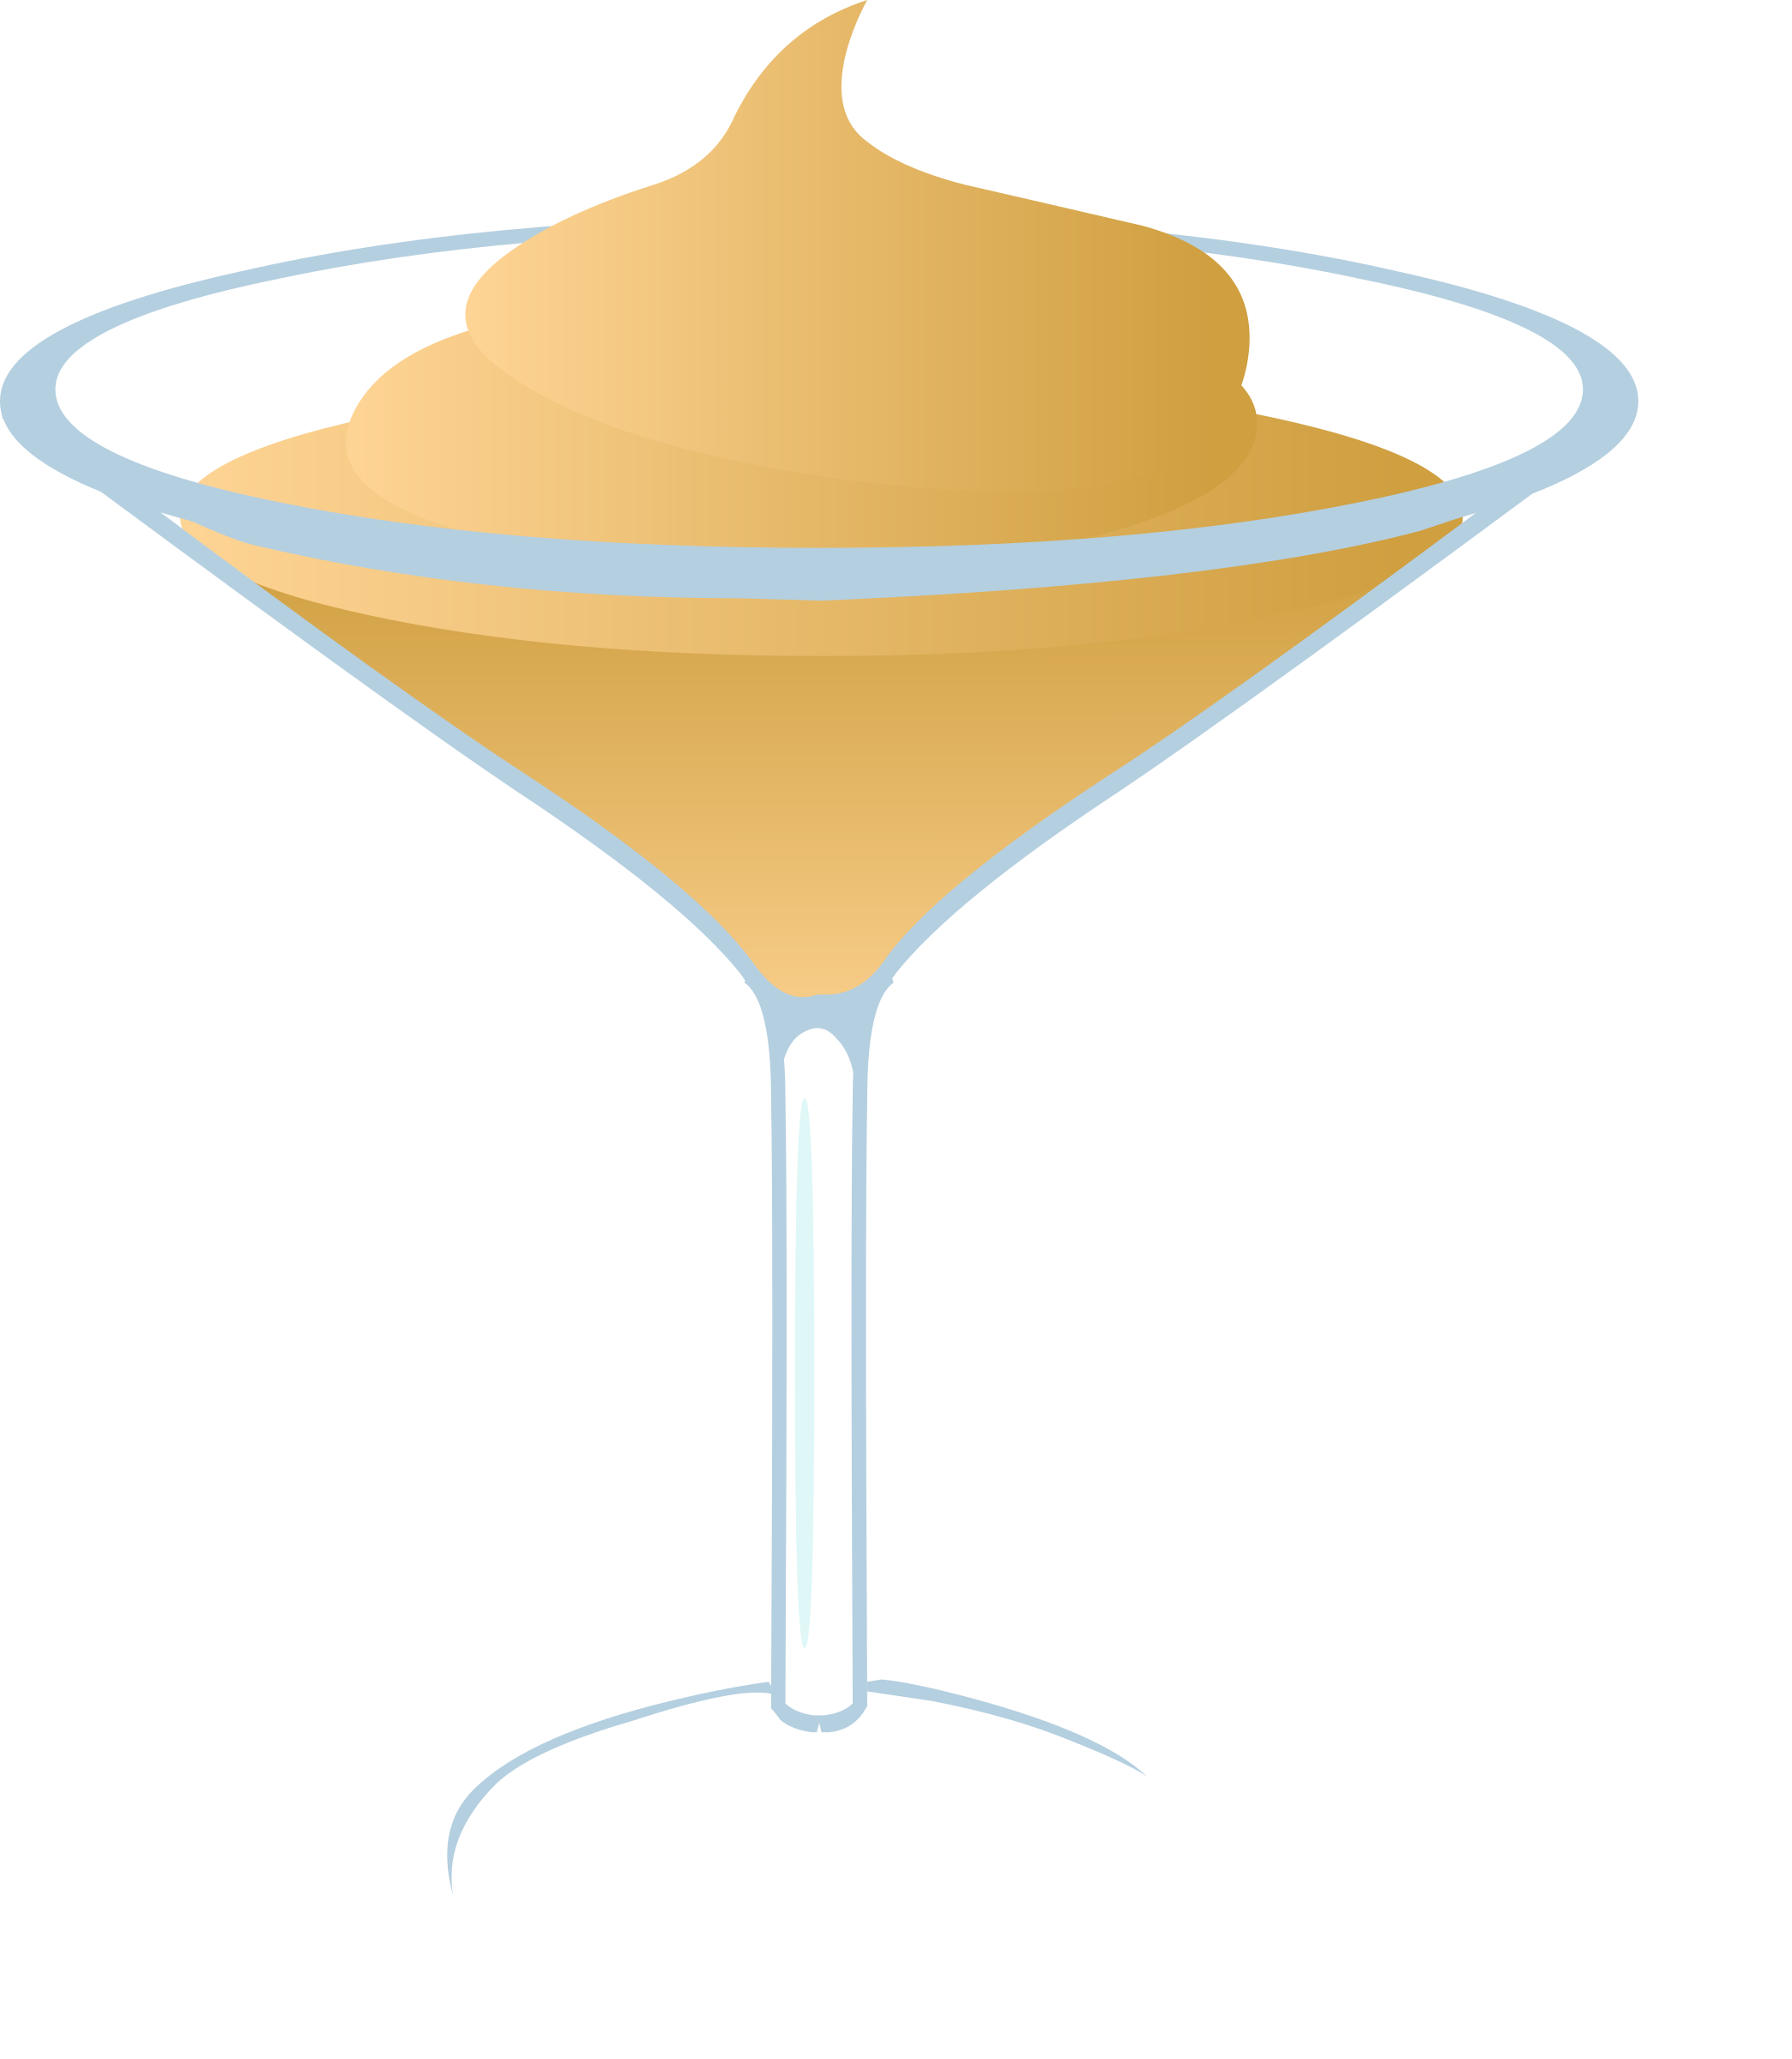 Fries clipart drink. Creamy martini big image